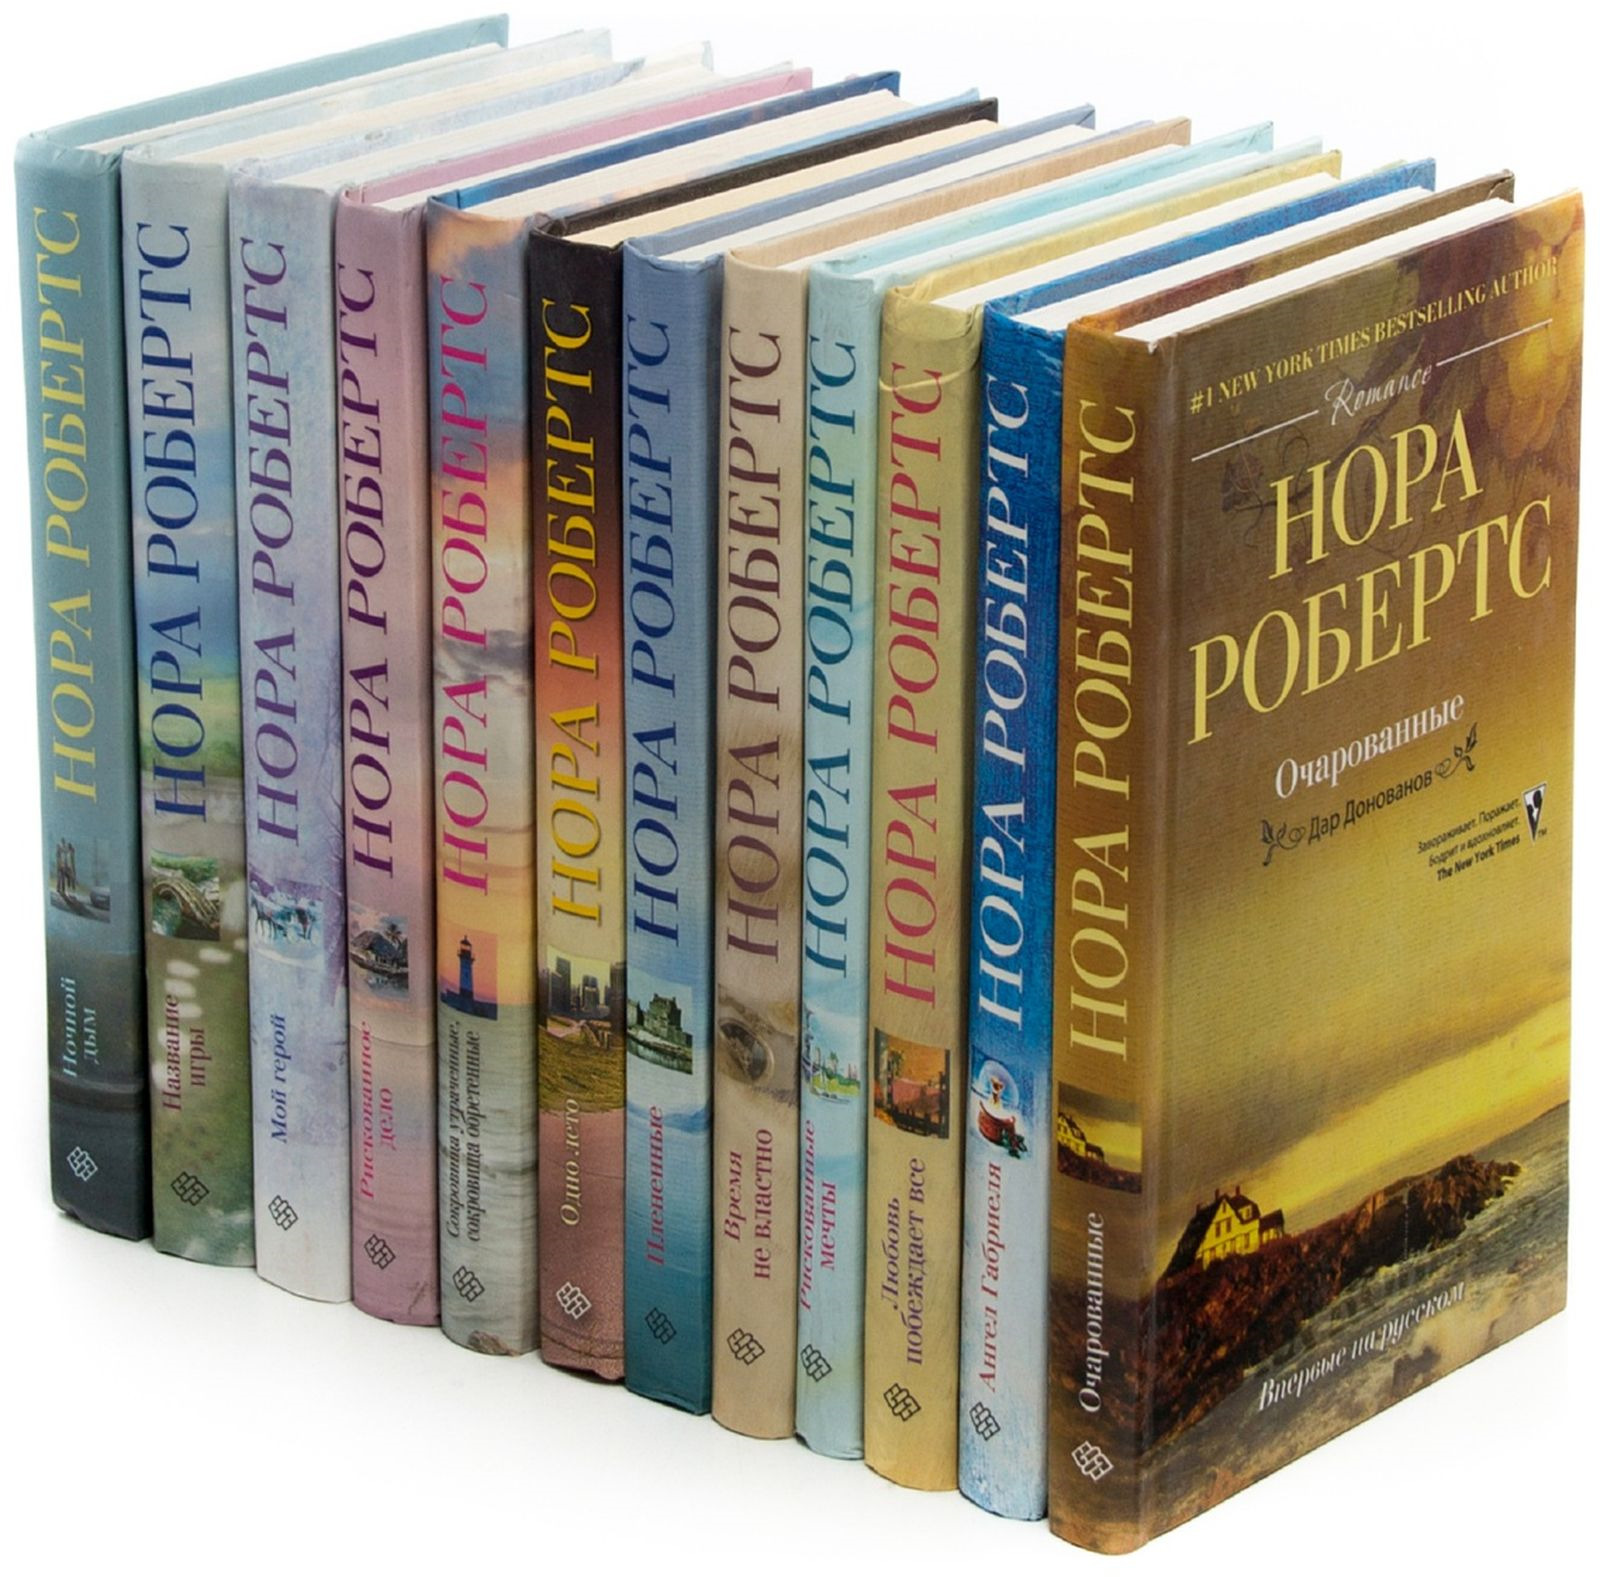 "Нора Робертс Нора Робертс. Серия ""#1 New York Times - Bestselling Author"" (комплект из 12 книг)"